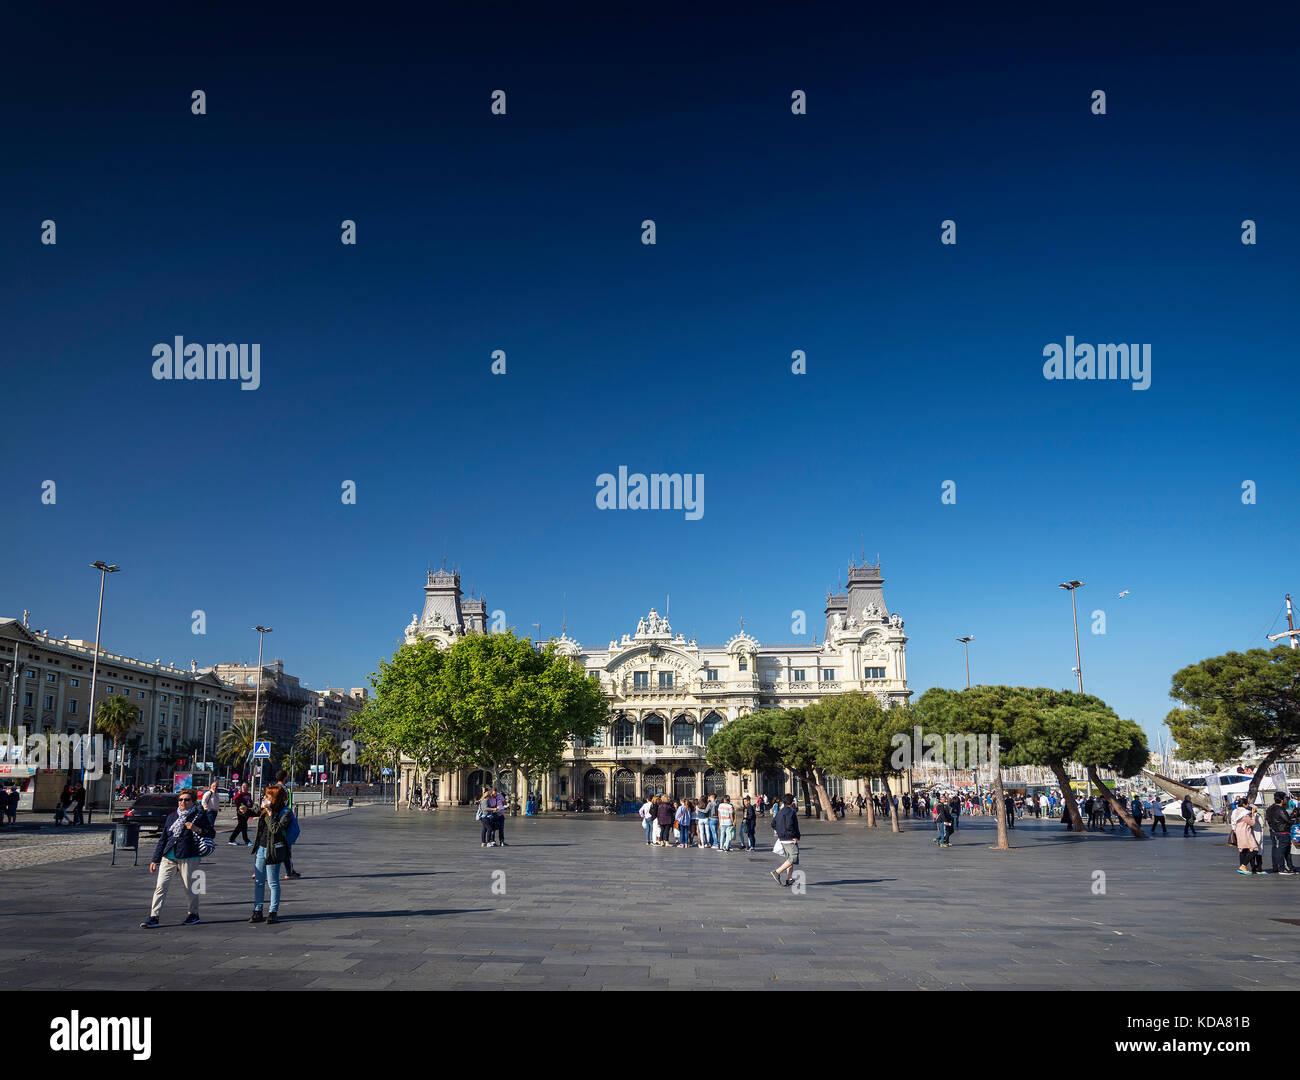 Port vell landmark catalan building in barcelona port area in spain - Stock Image